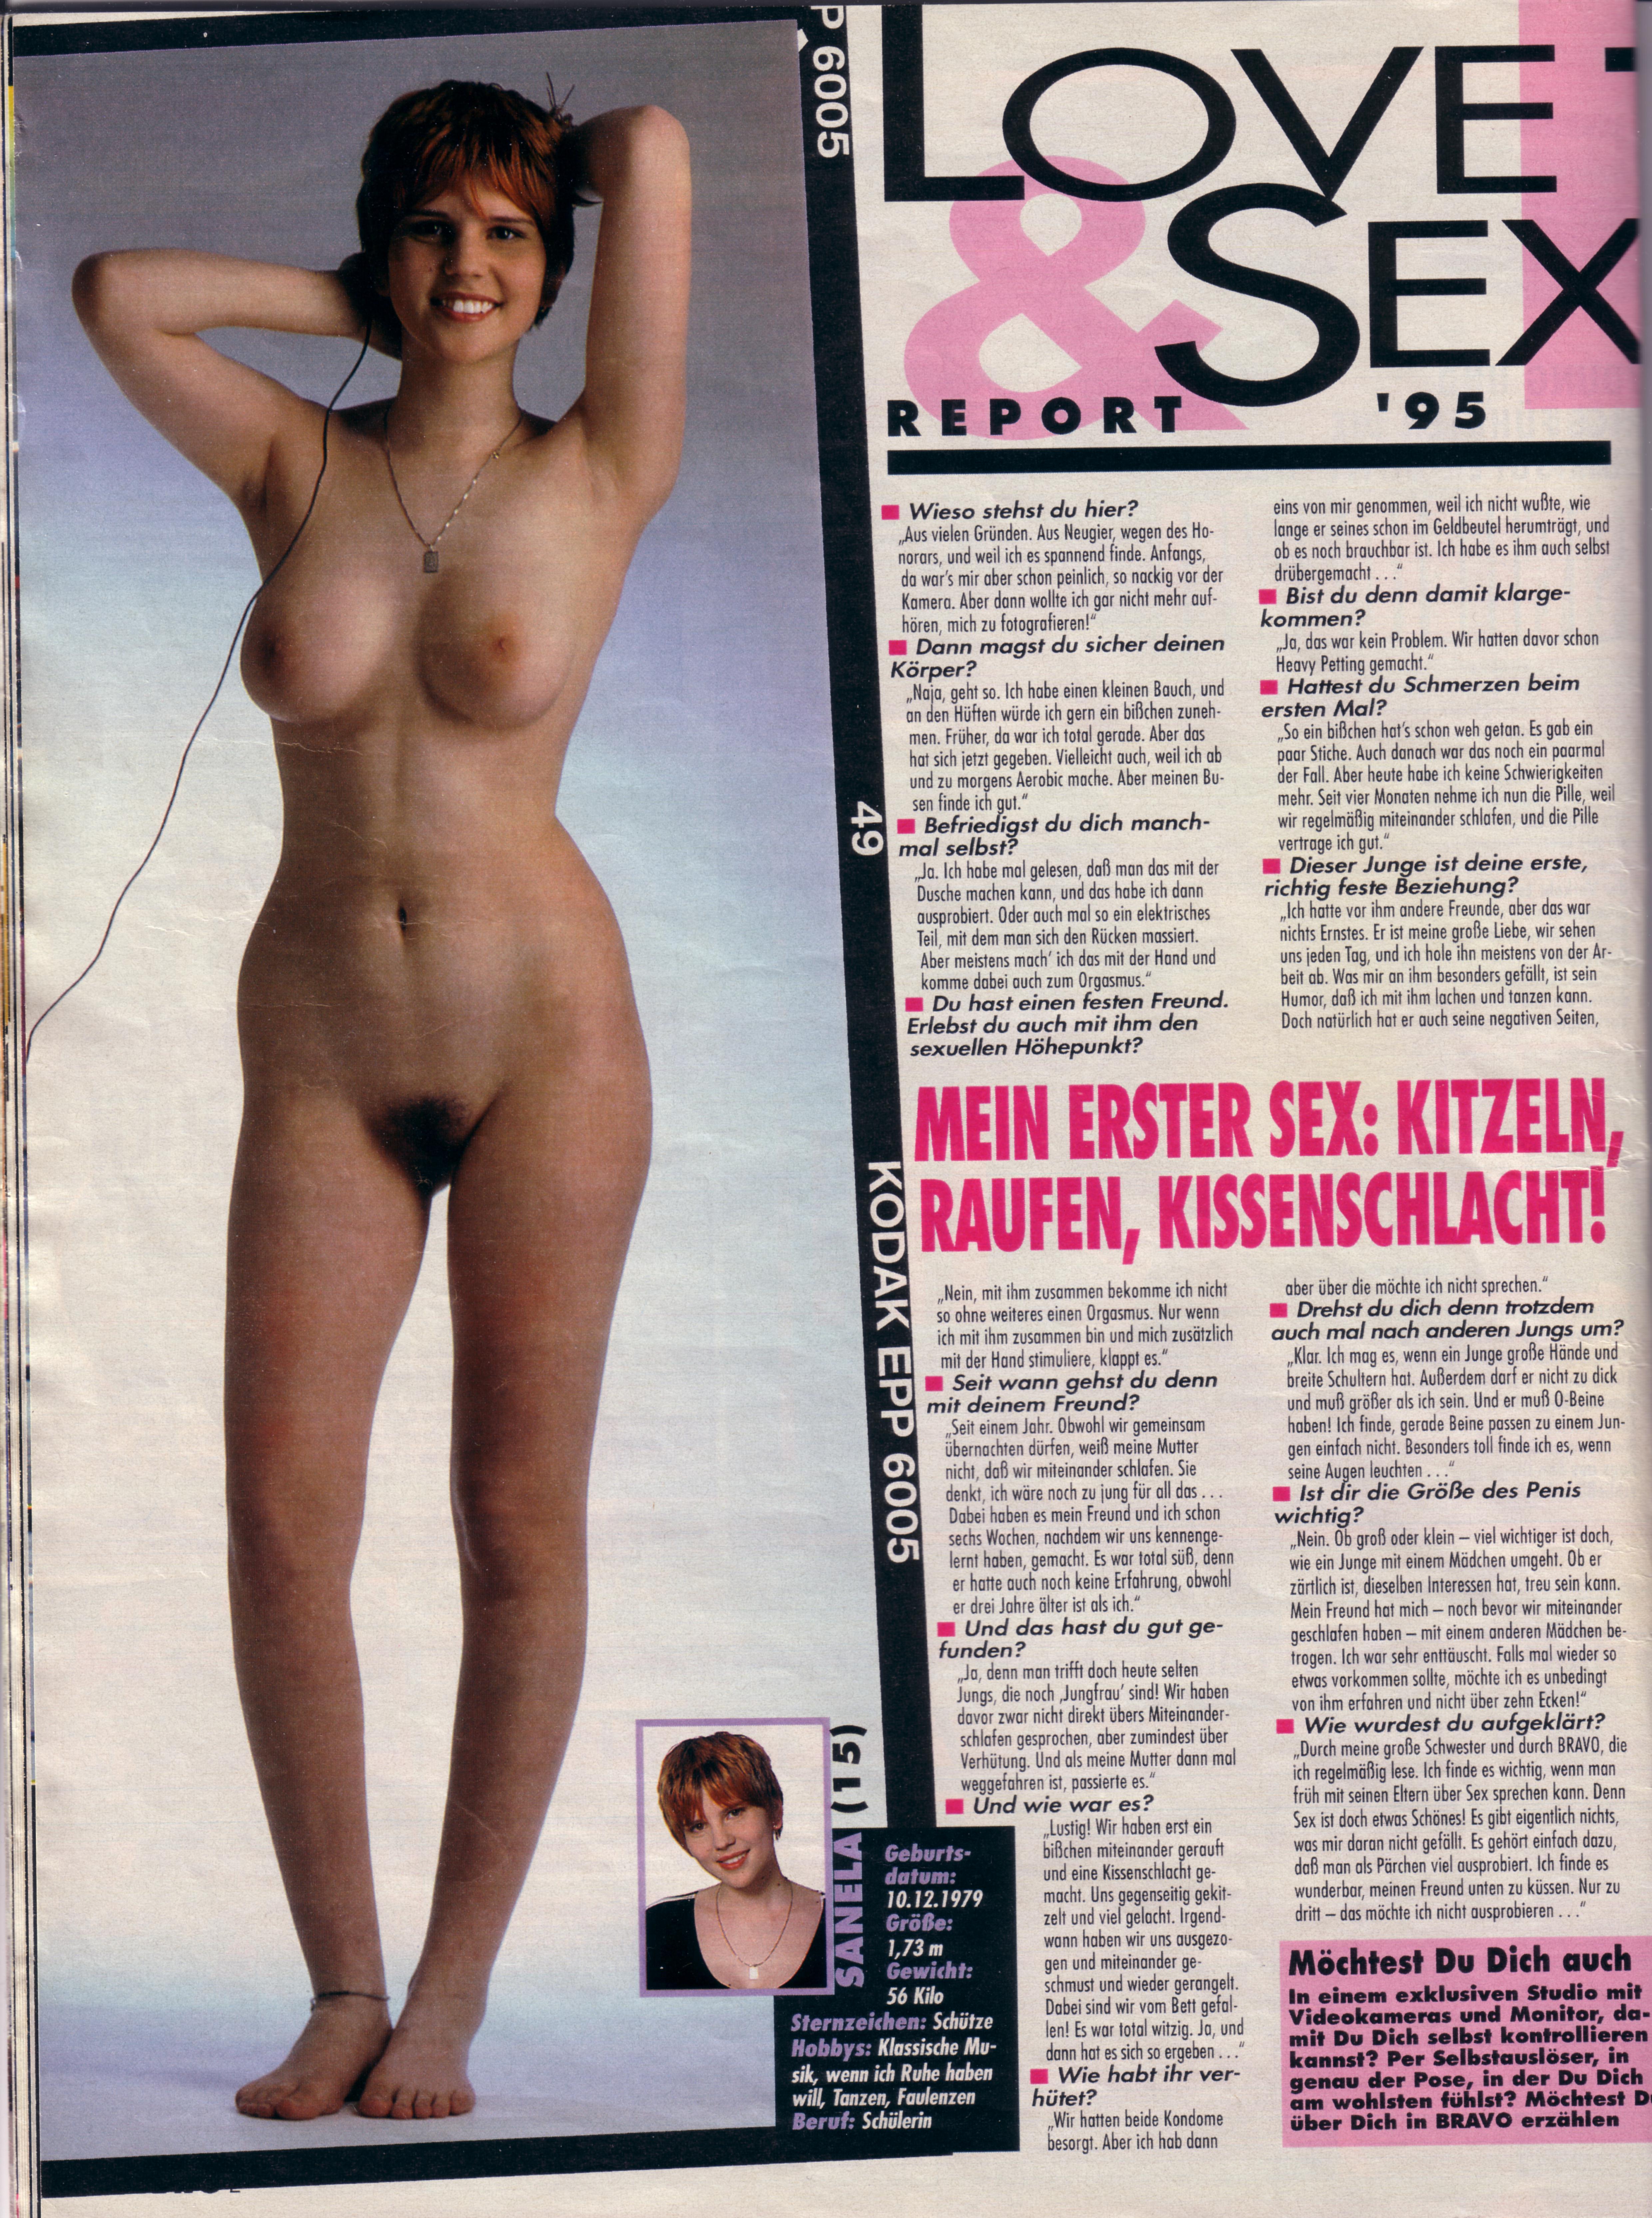 Karisma kapoor naked image